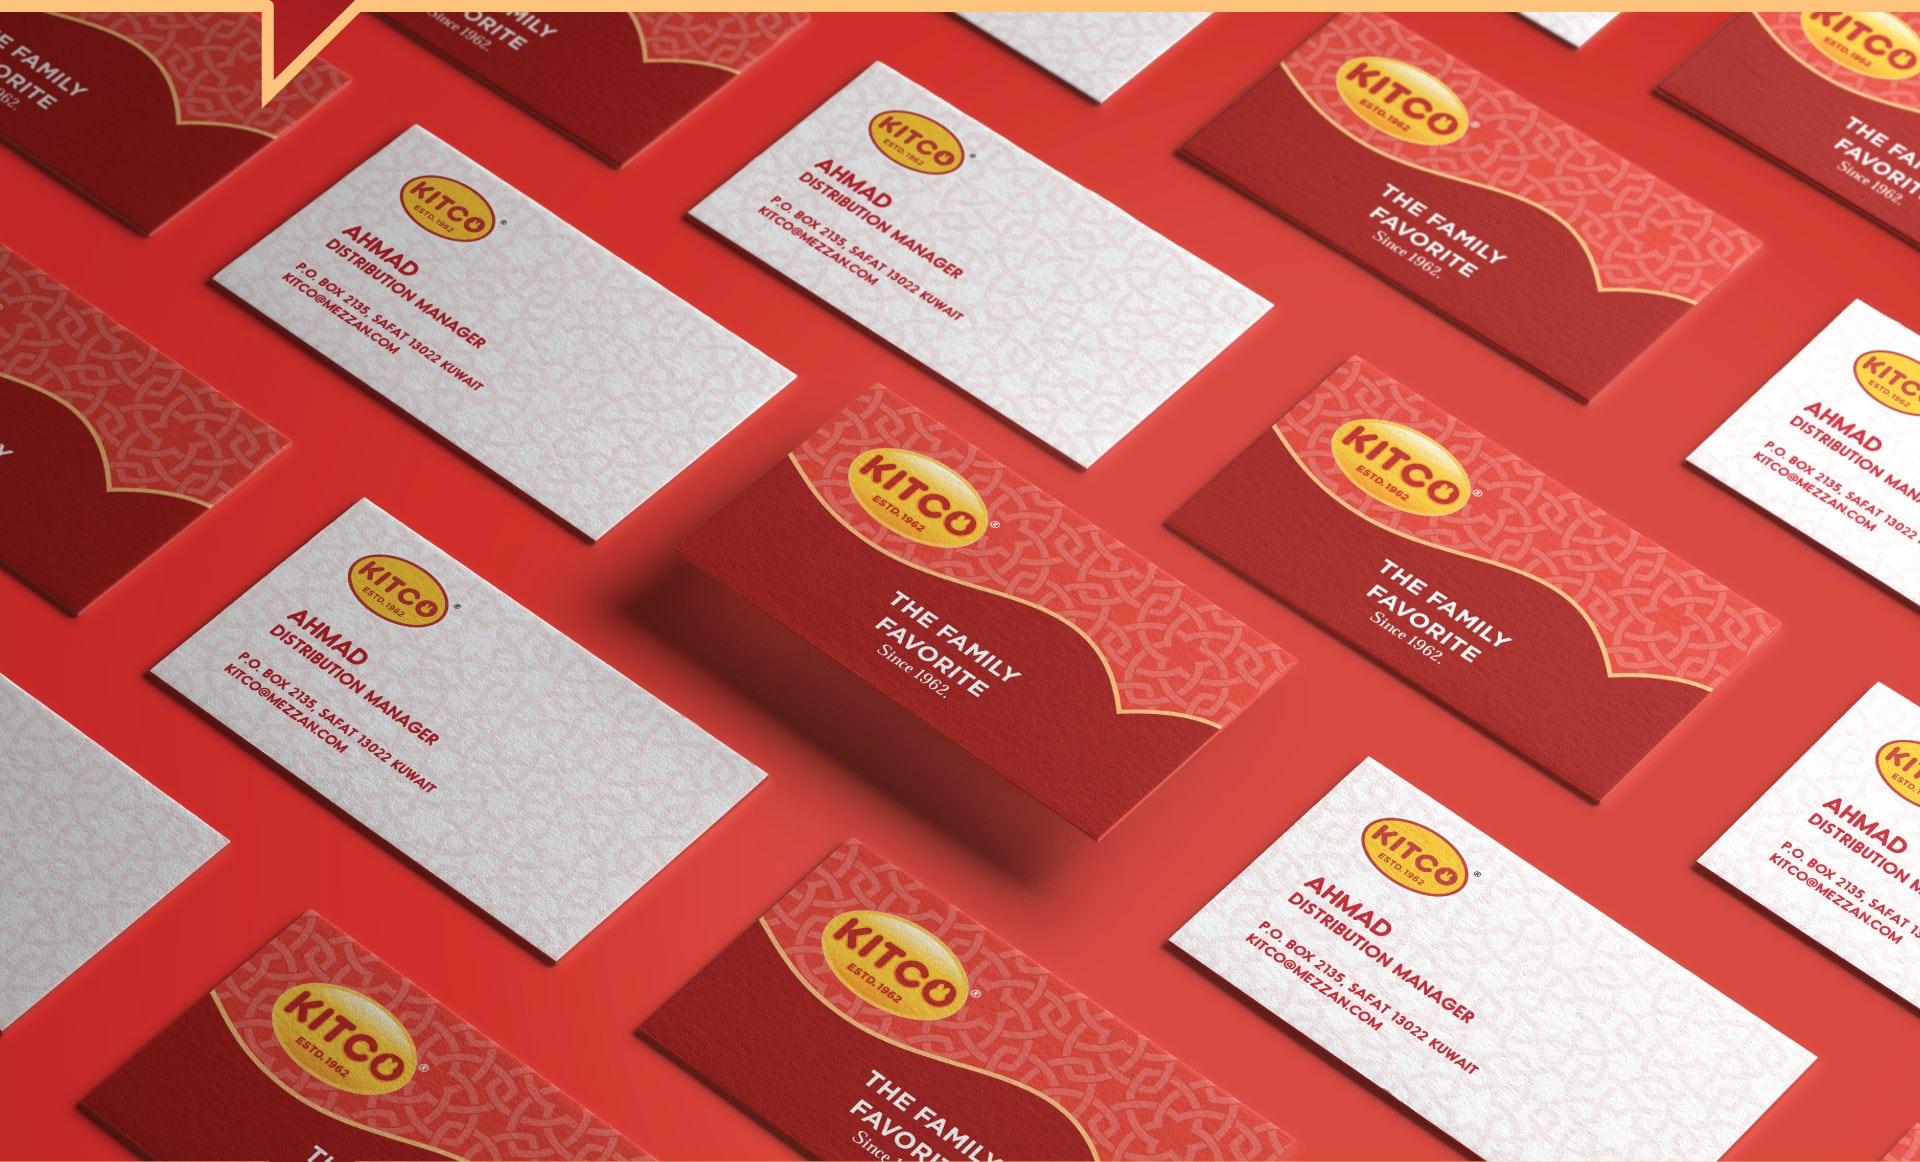 Kitco Masterbrand - Brand Activation